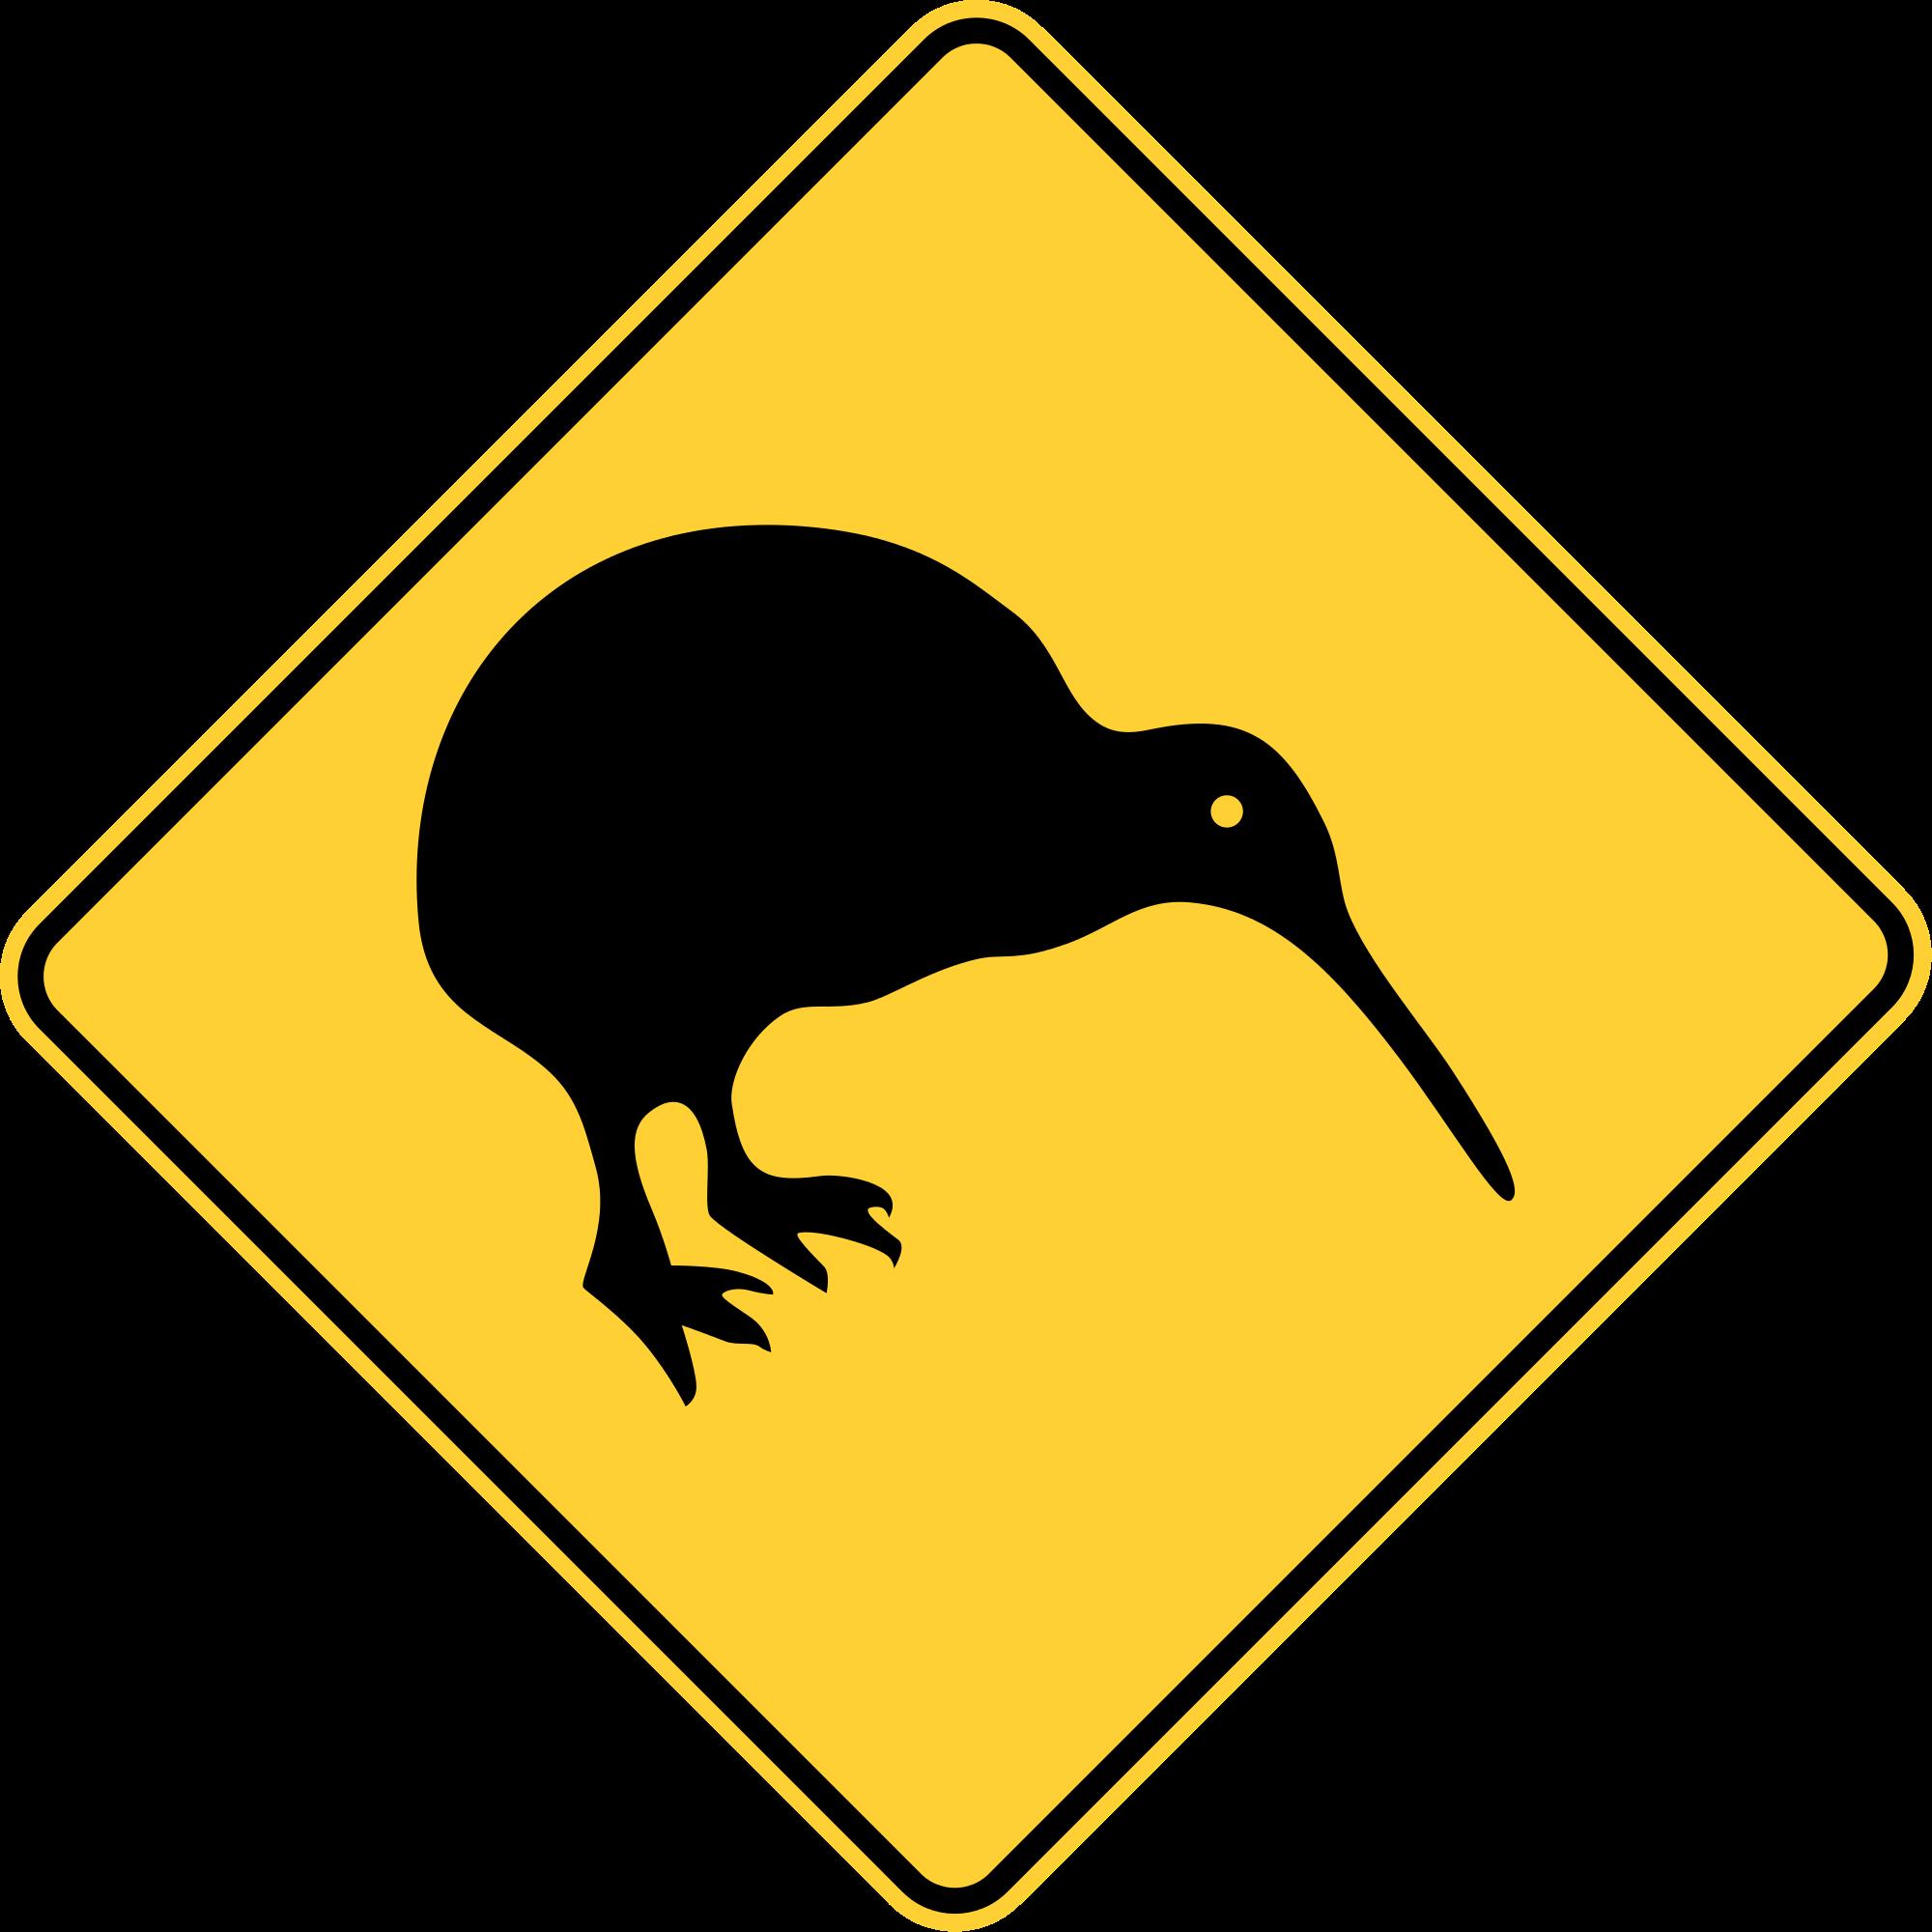 Kiwi clipart kiwi bird. File new zealand road